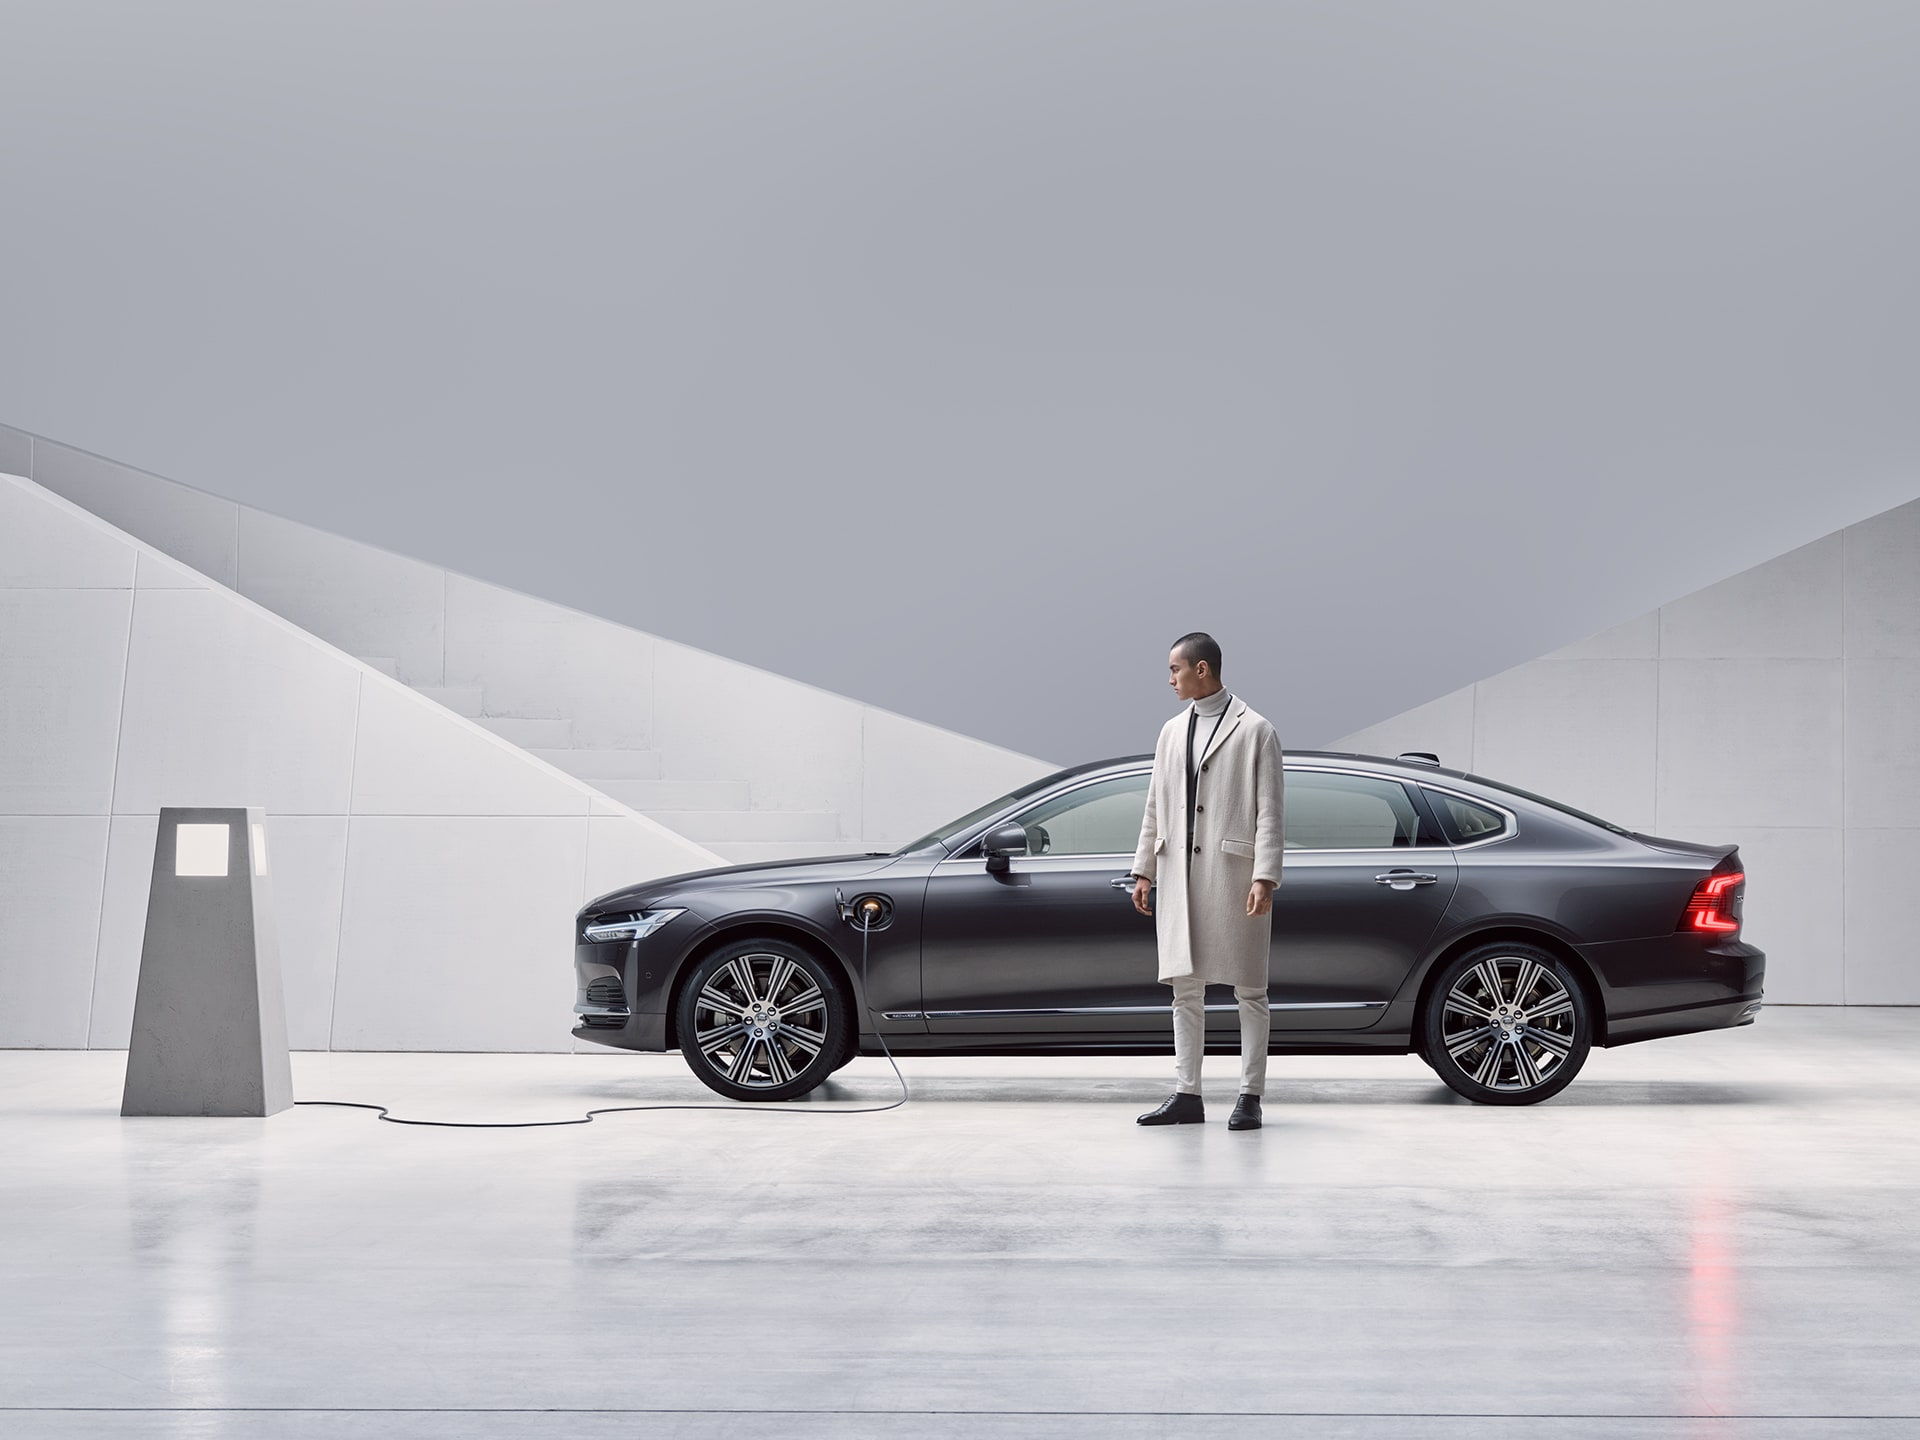 Um homem junto ao seu sedan Volvo S90 Recharge híbrido plug-in, de cor cinza, a carregar.